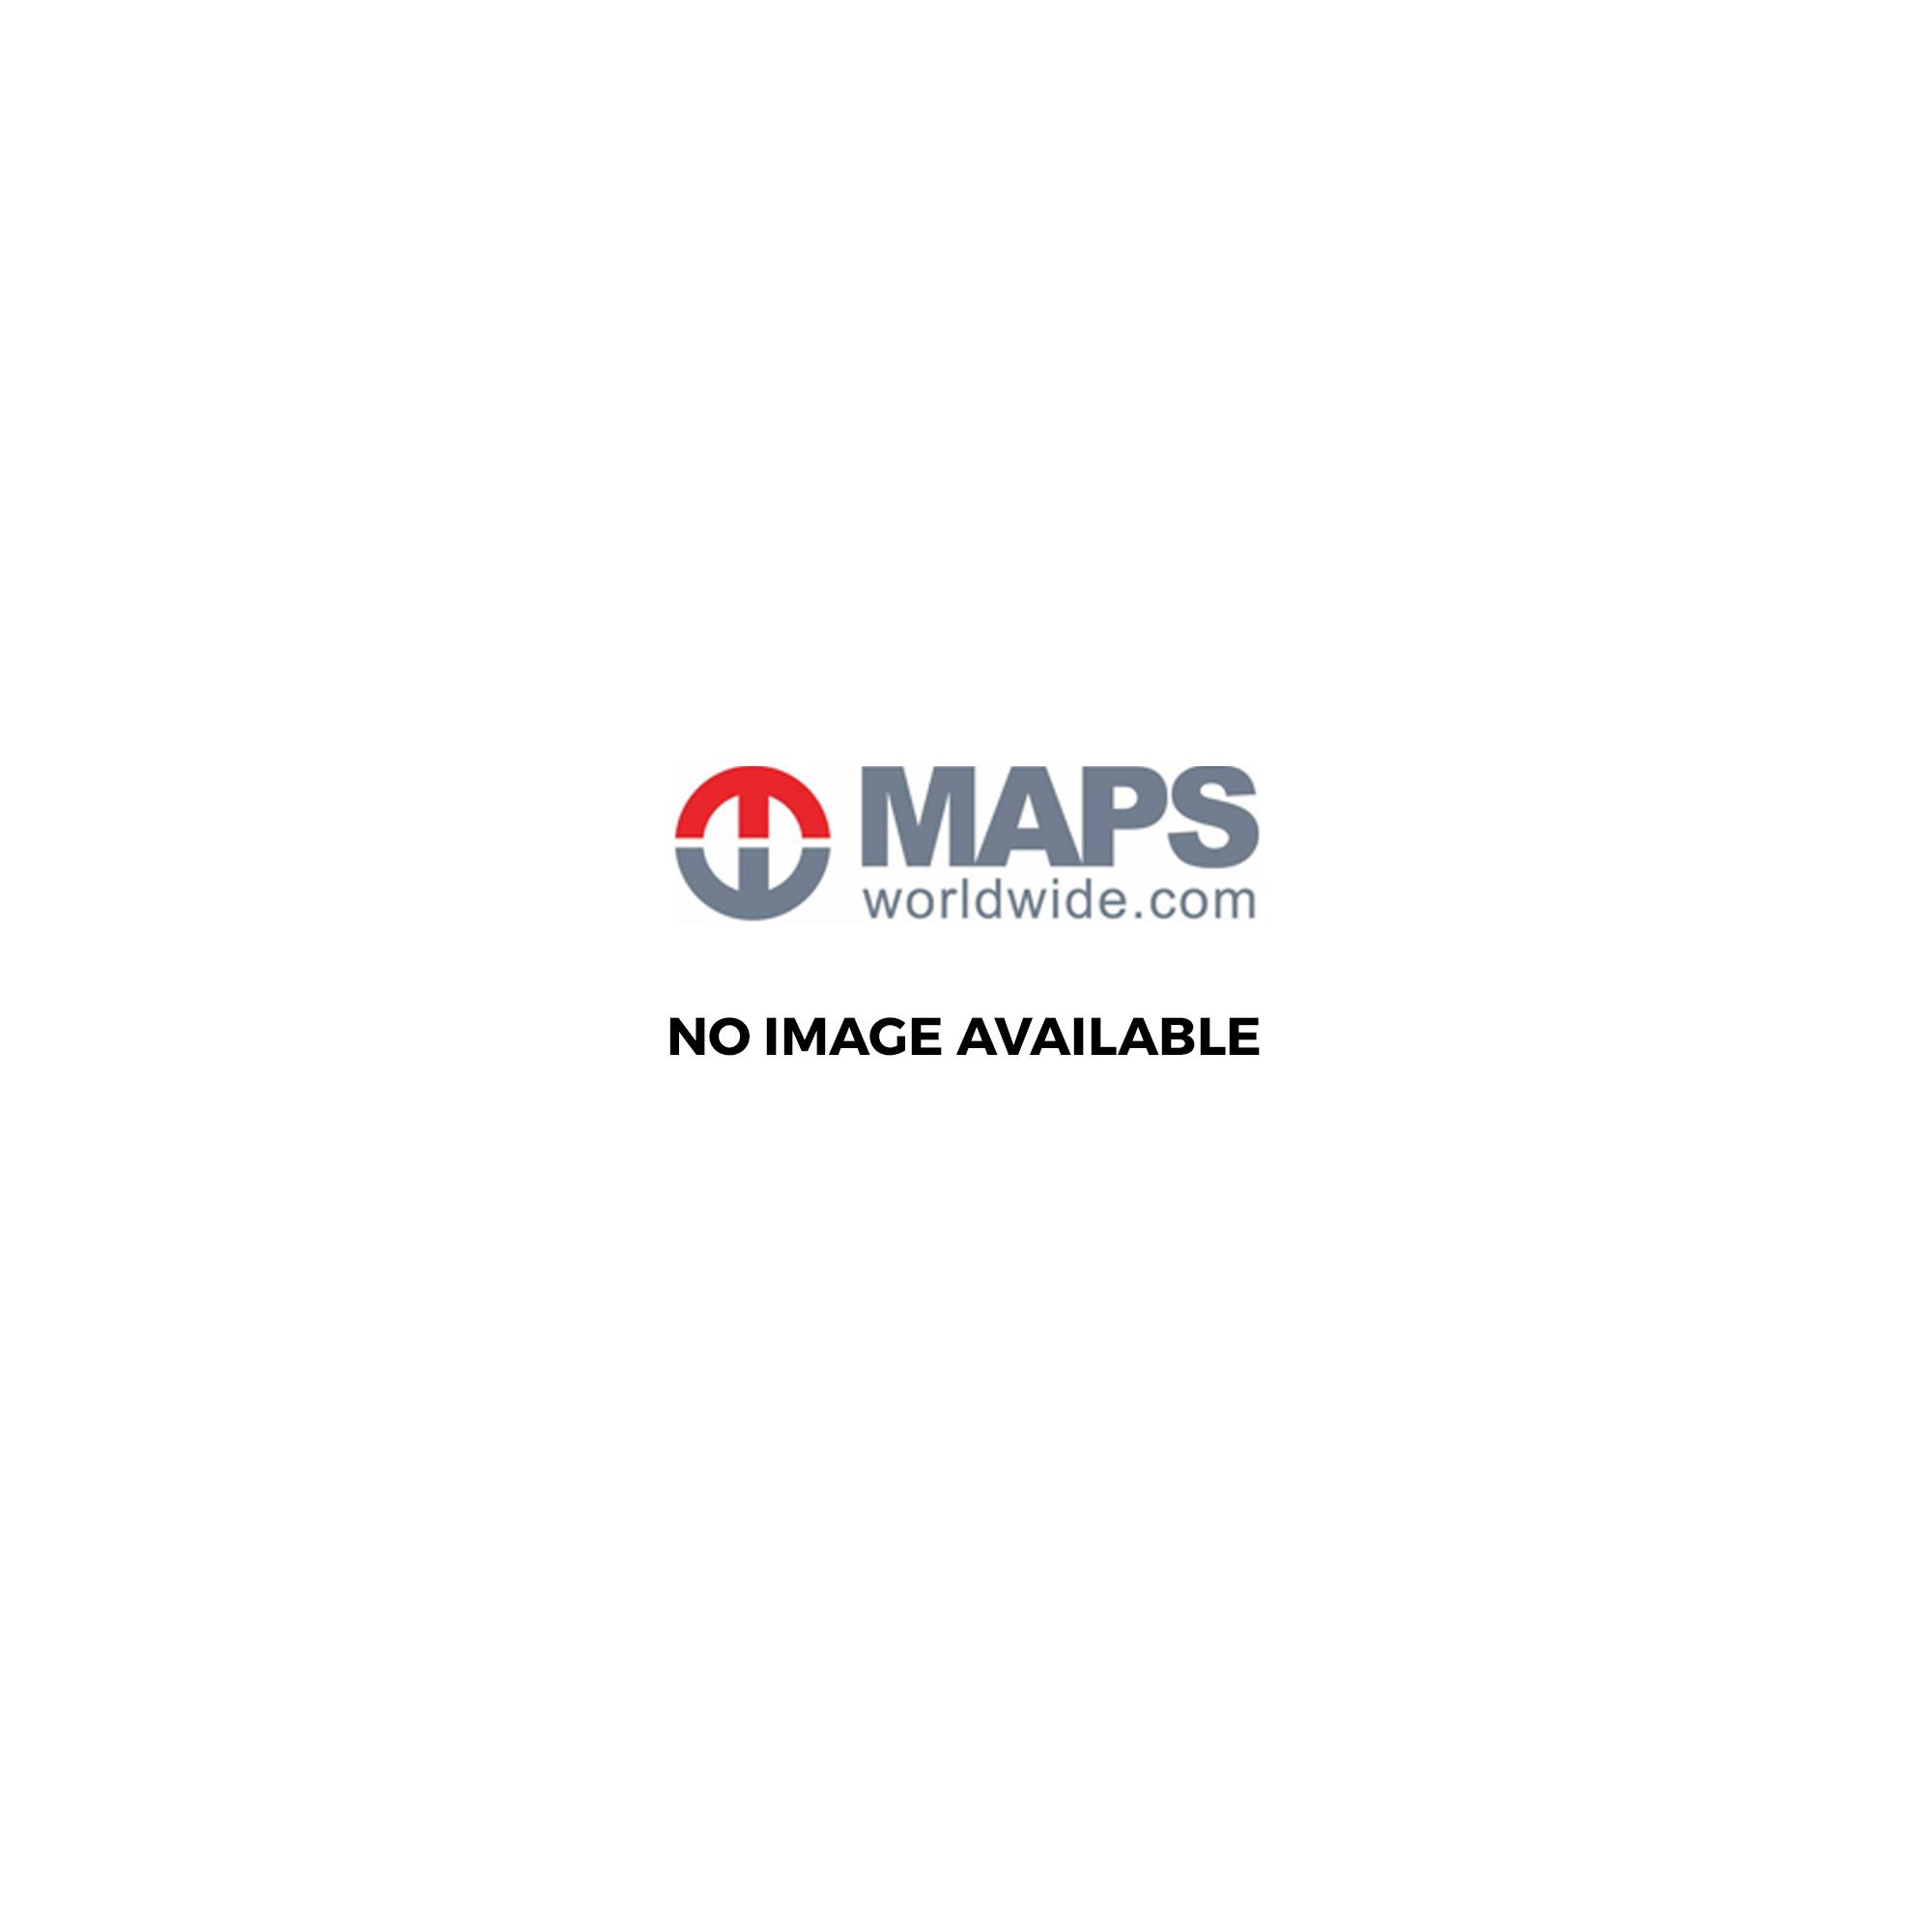 Calvados France Map.Michelin Local Maps Of France 303 Calvados Manche